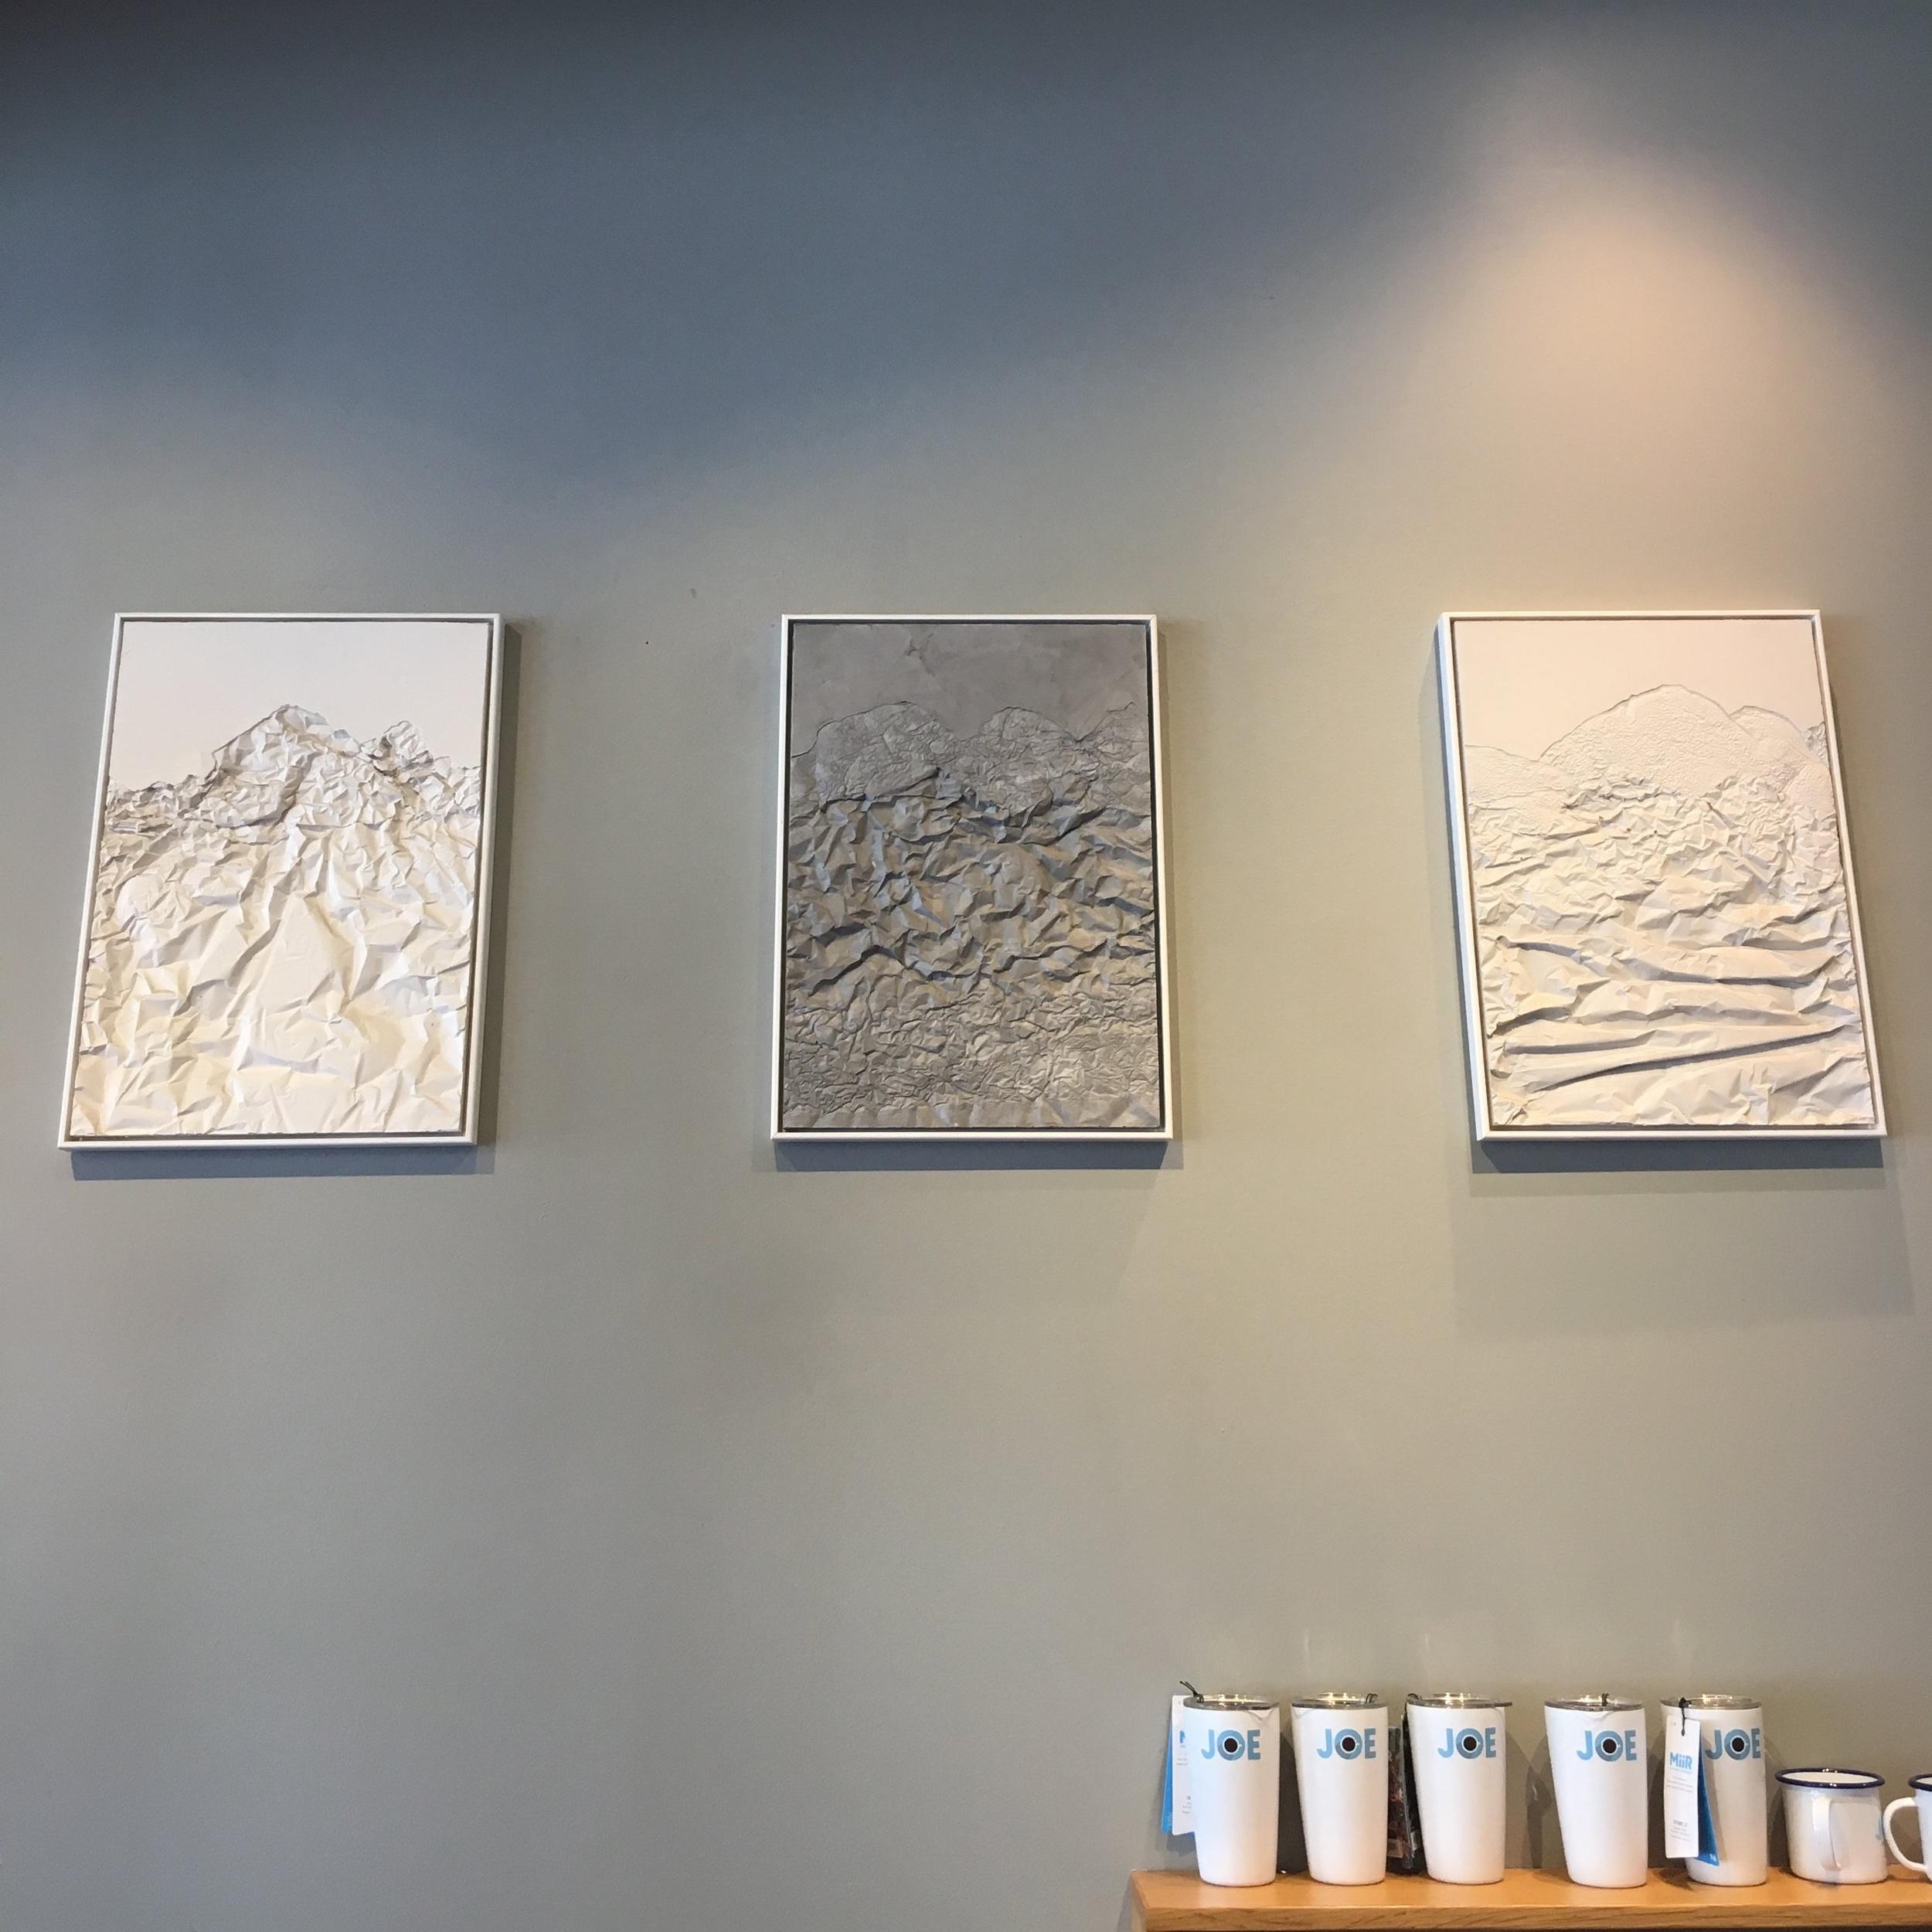 Artwork by  Pajtim Osmanaj  at Joe's Coffee on UWS. Photo cred: YPA NYC